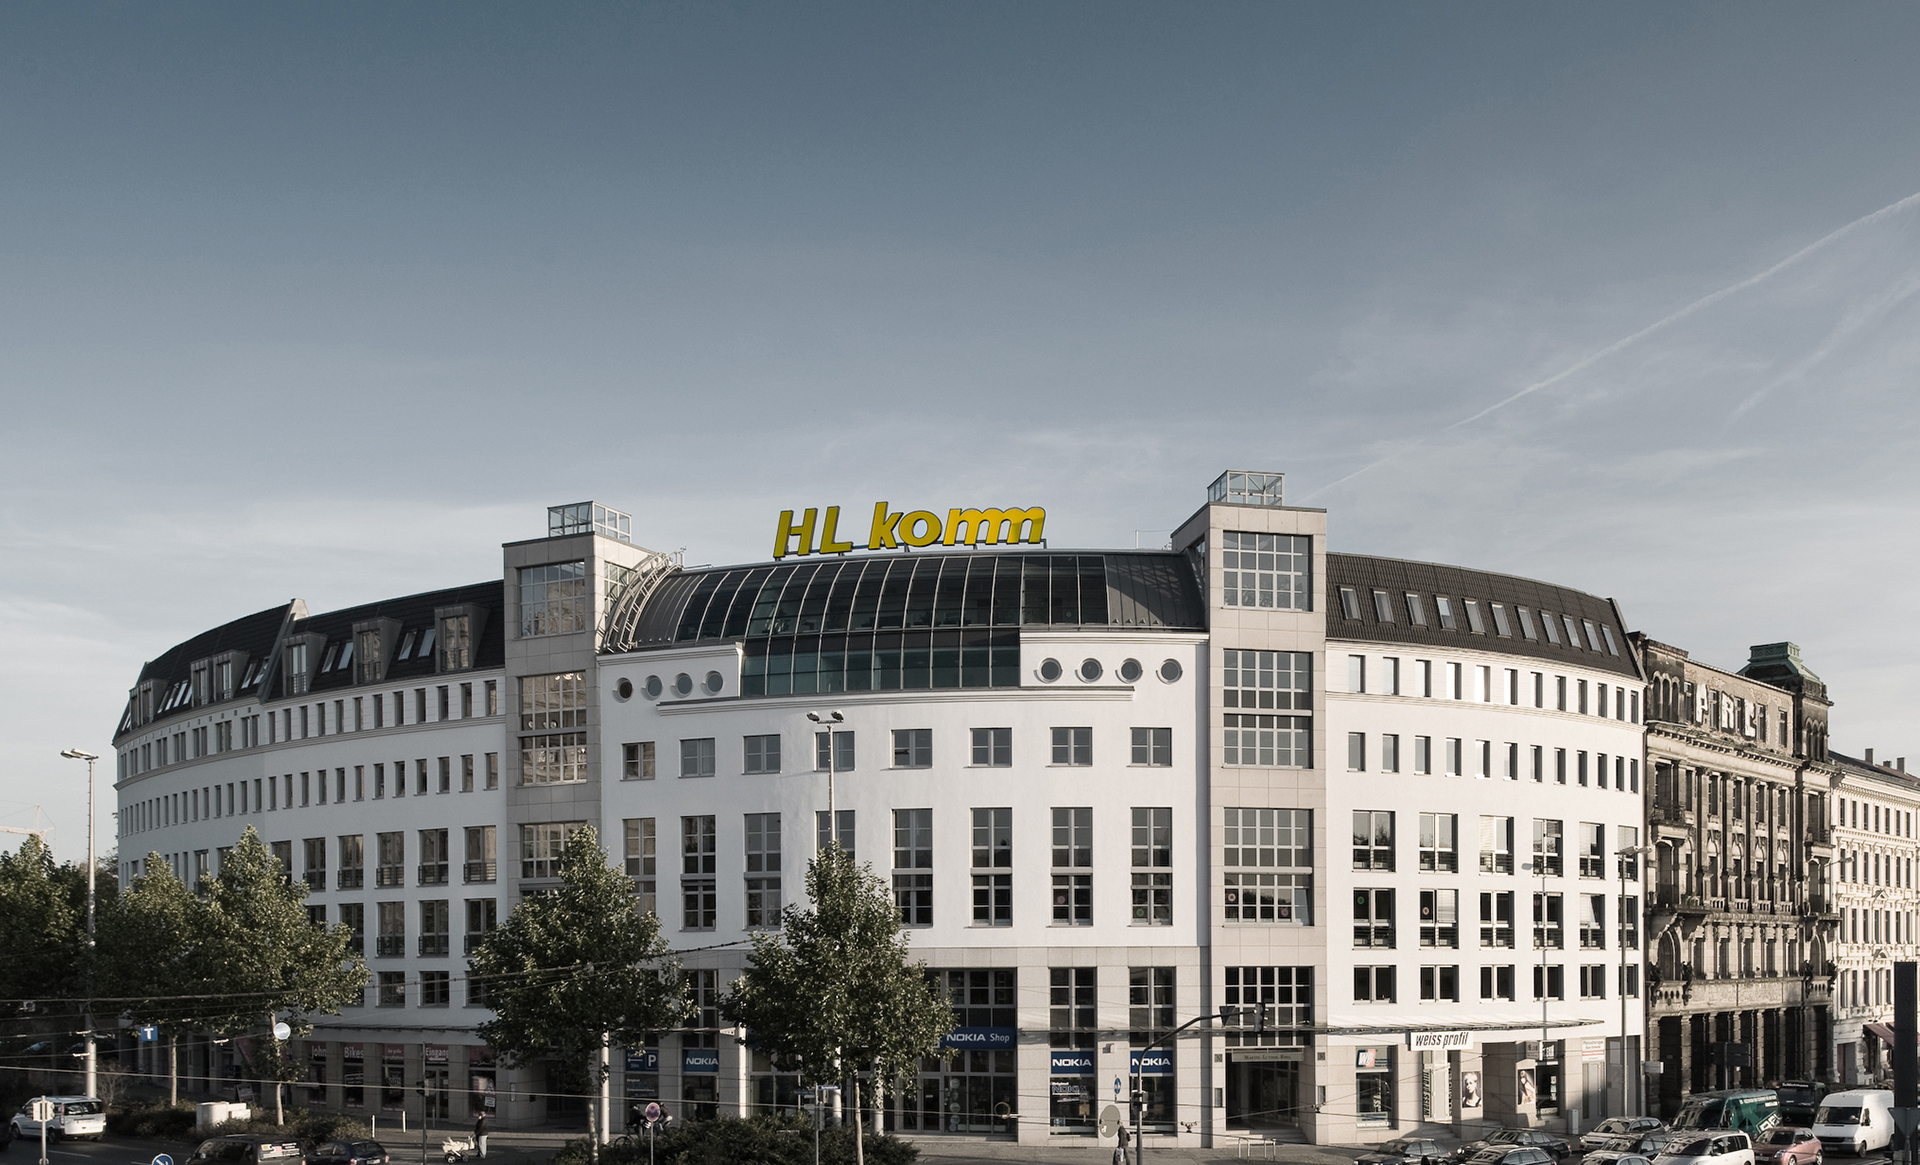 Sitz der HL komm Telekommunikations GmbH